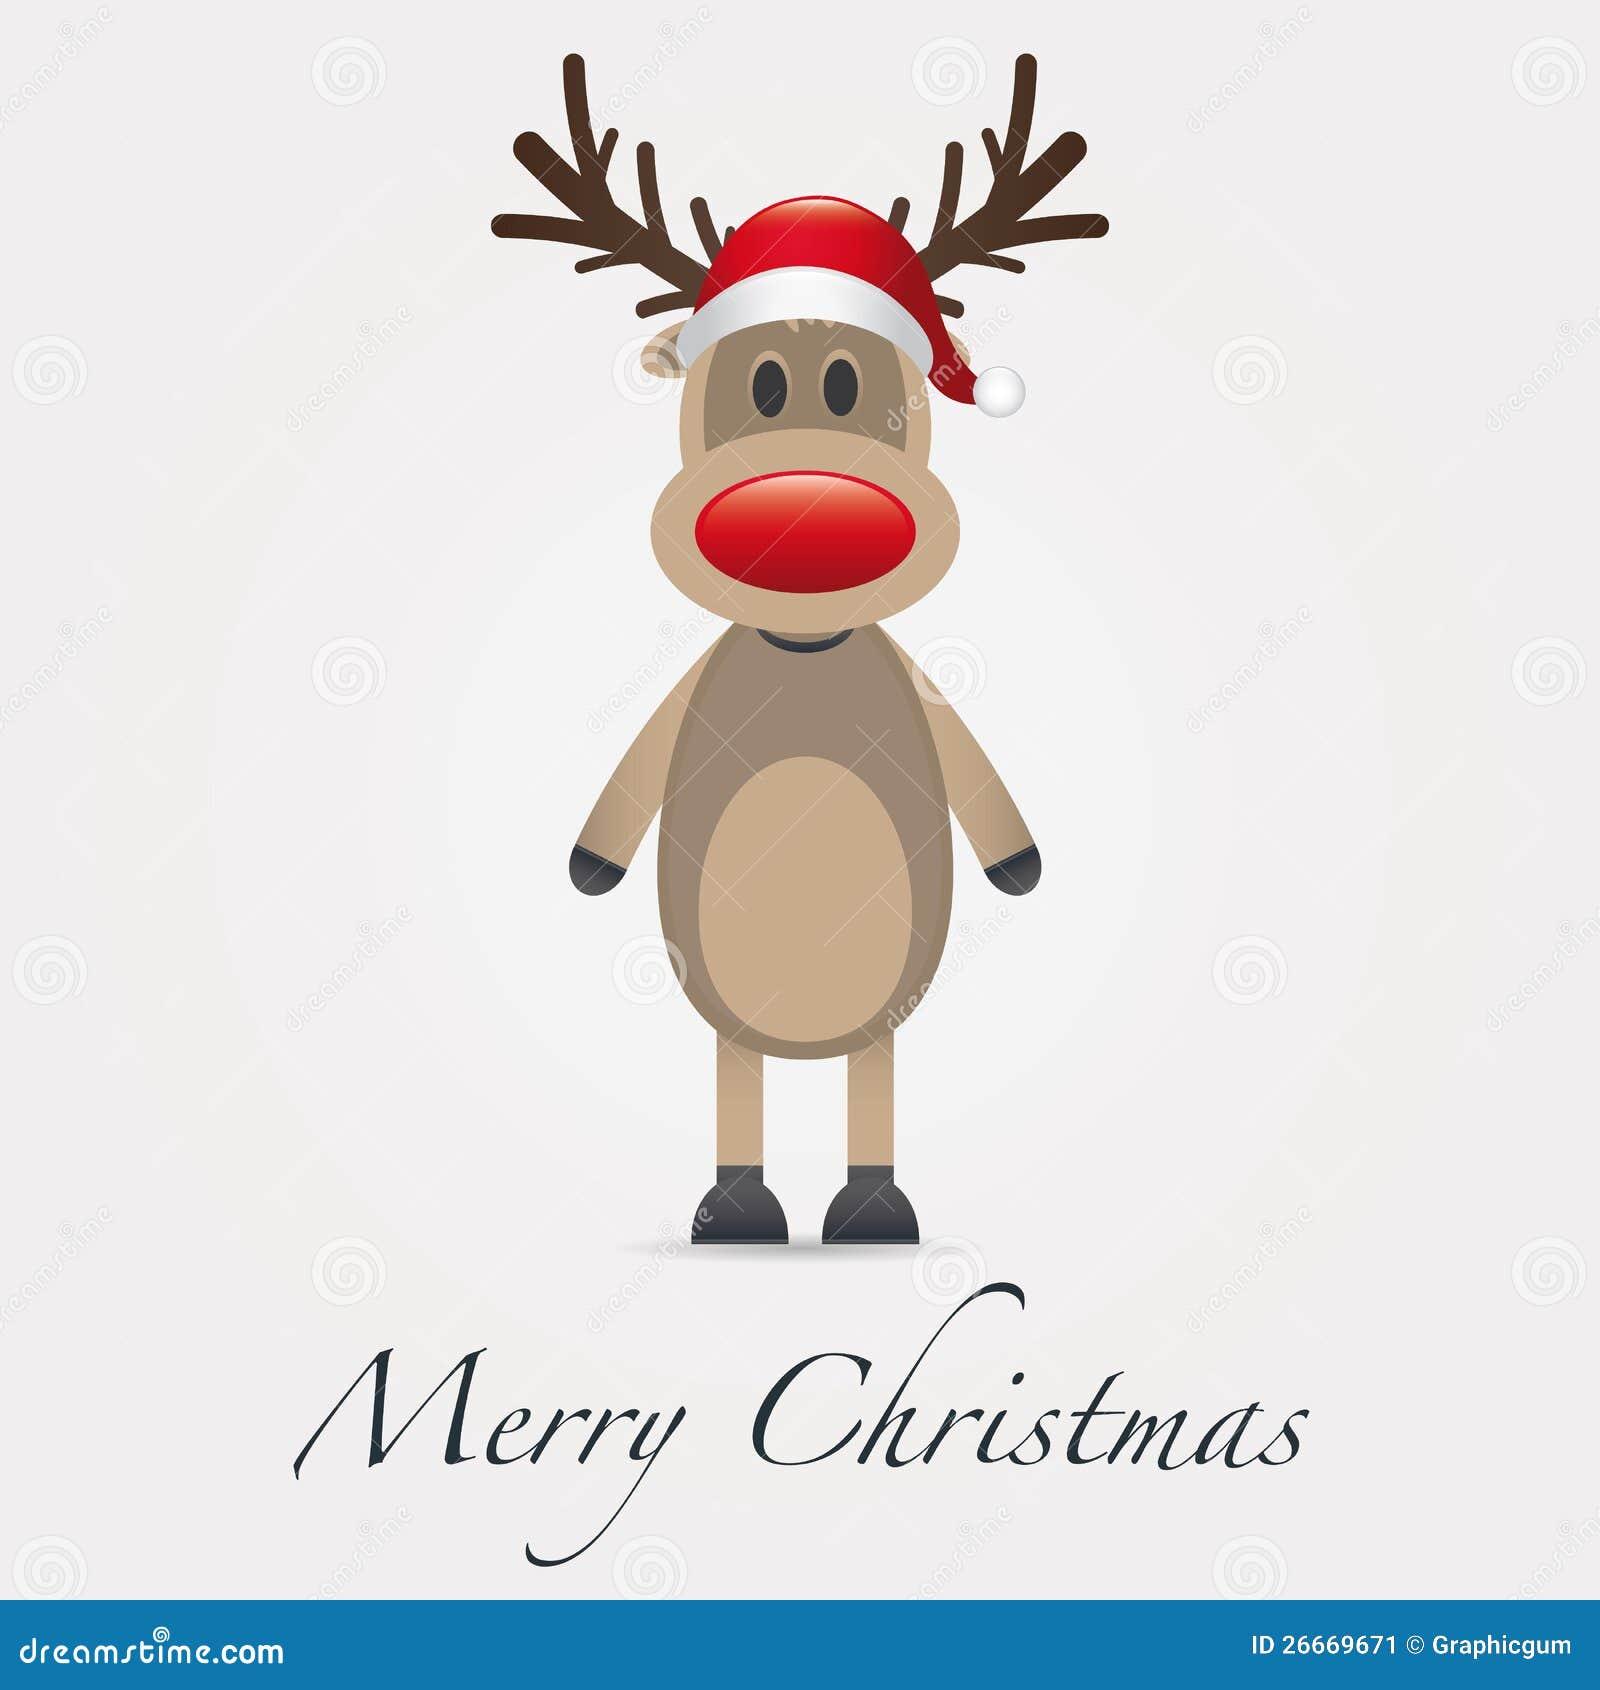 reindeer red nose santa claus hat animal alone - Reindeer And Santa